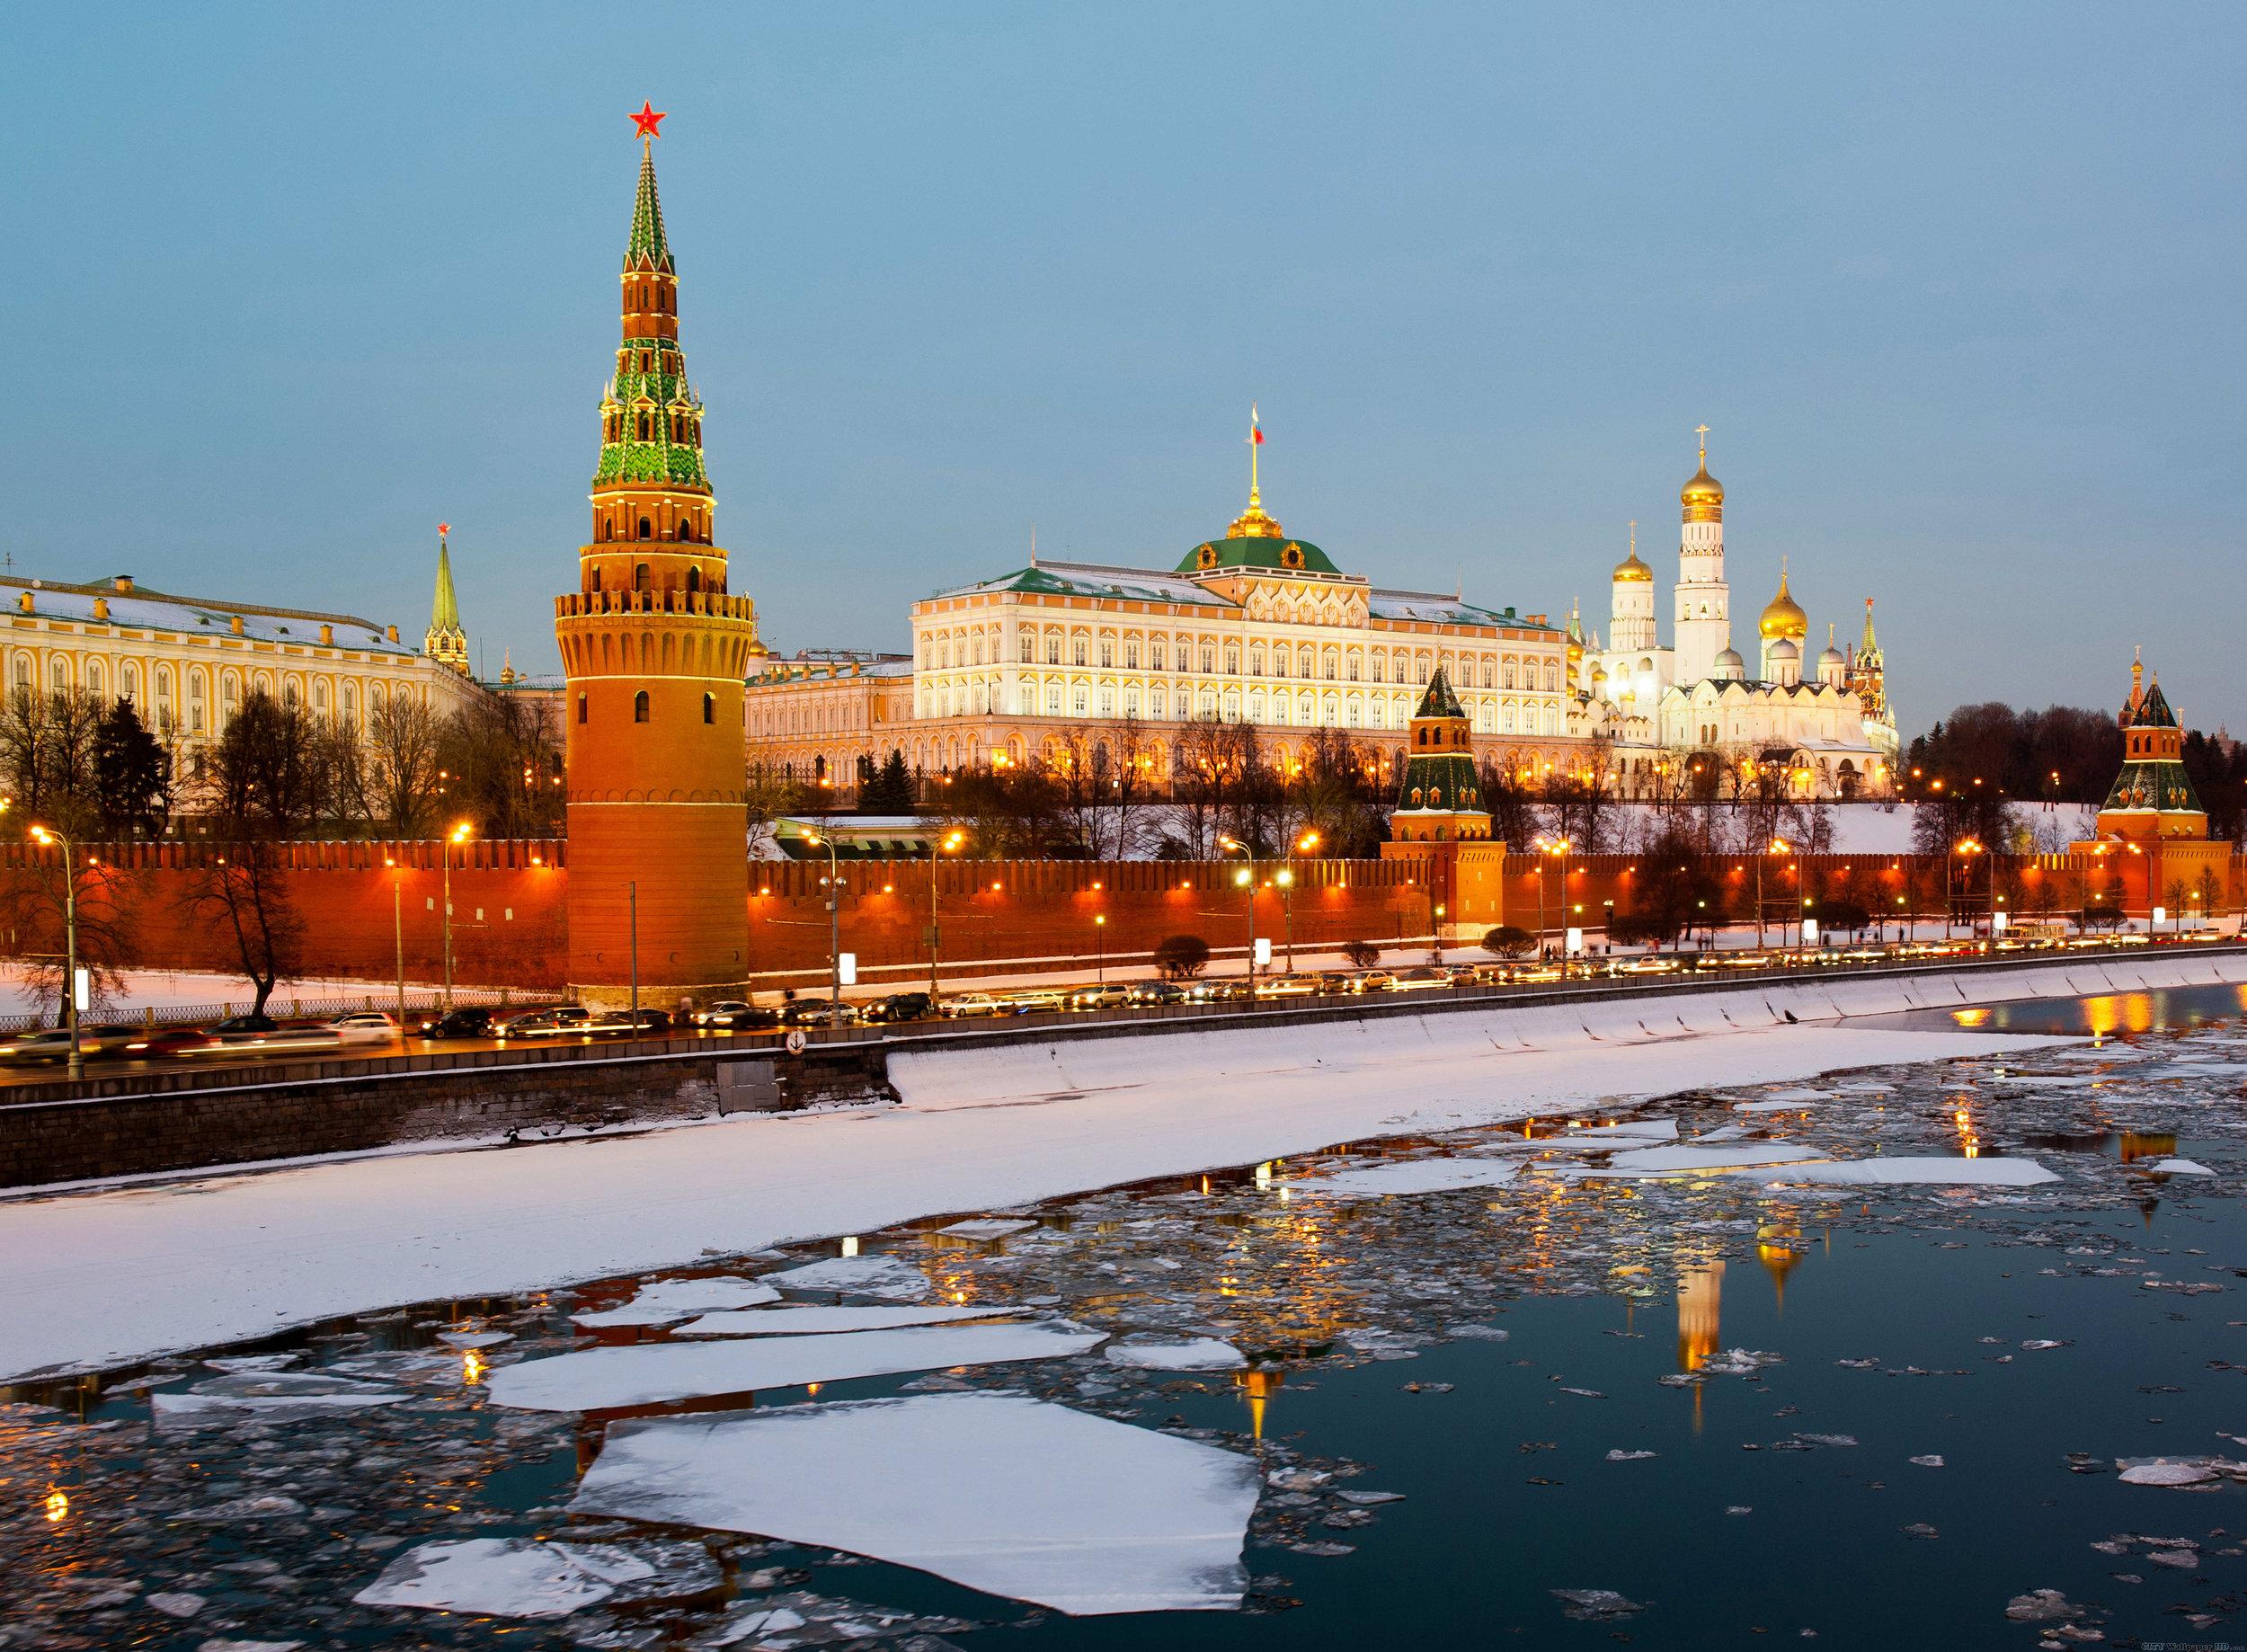 340-moscow-kremlin-wallpaper.jpg